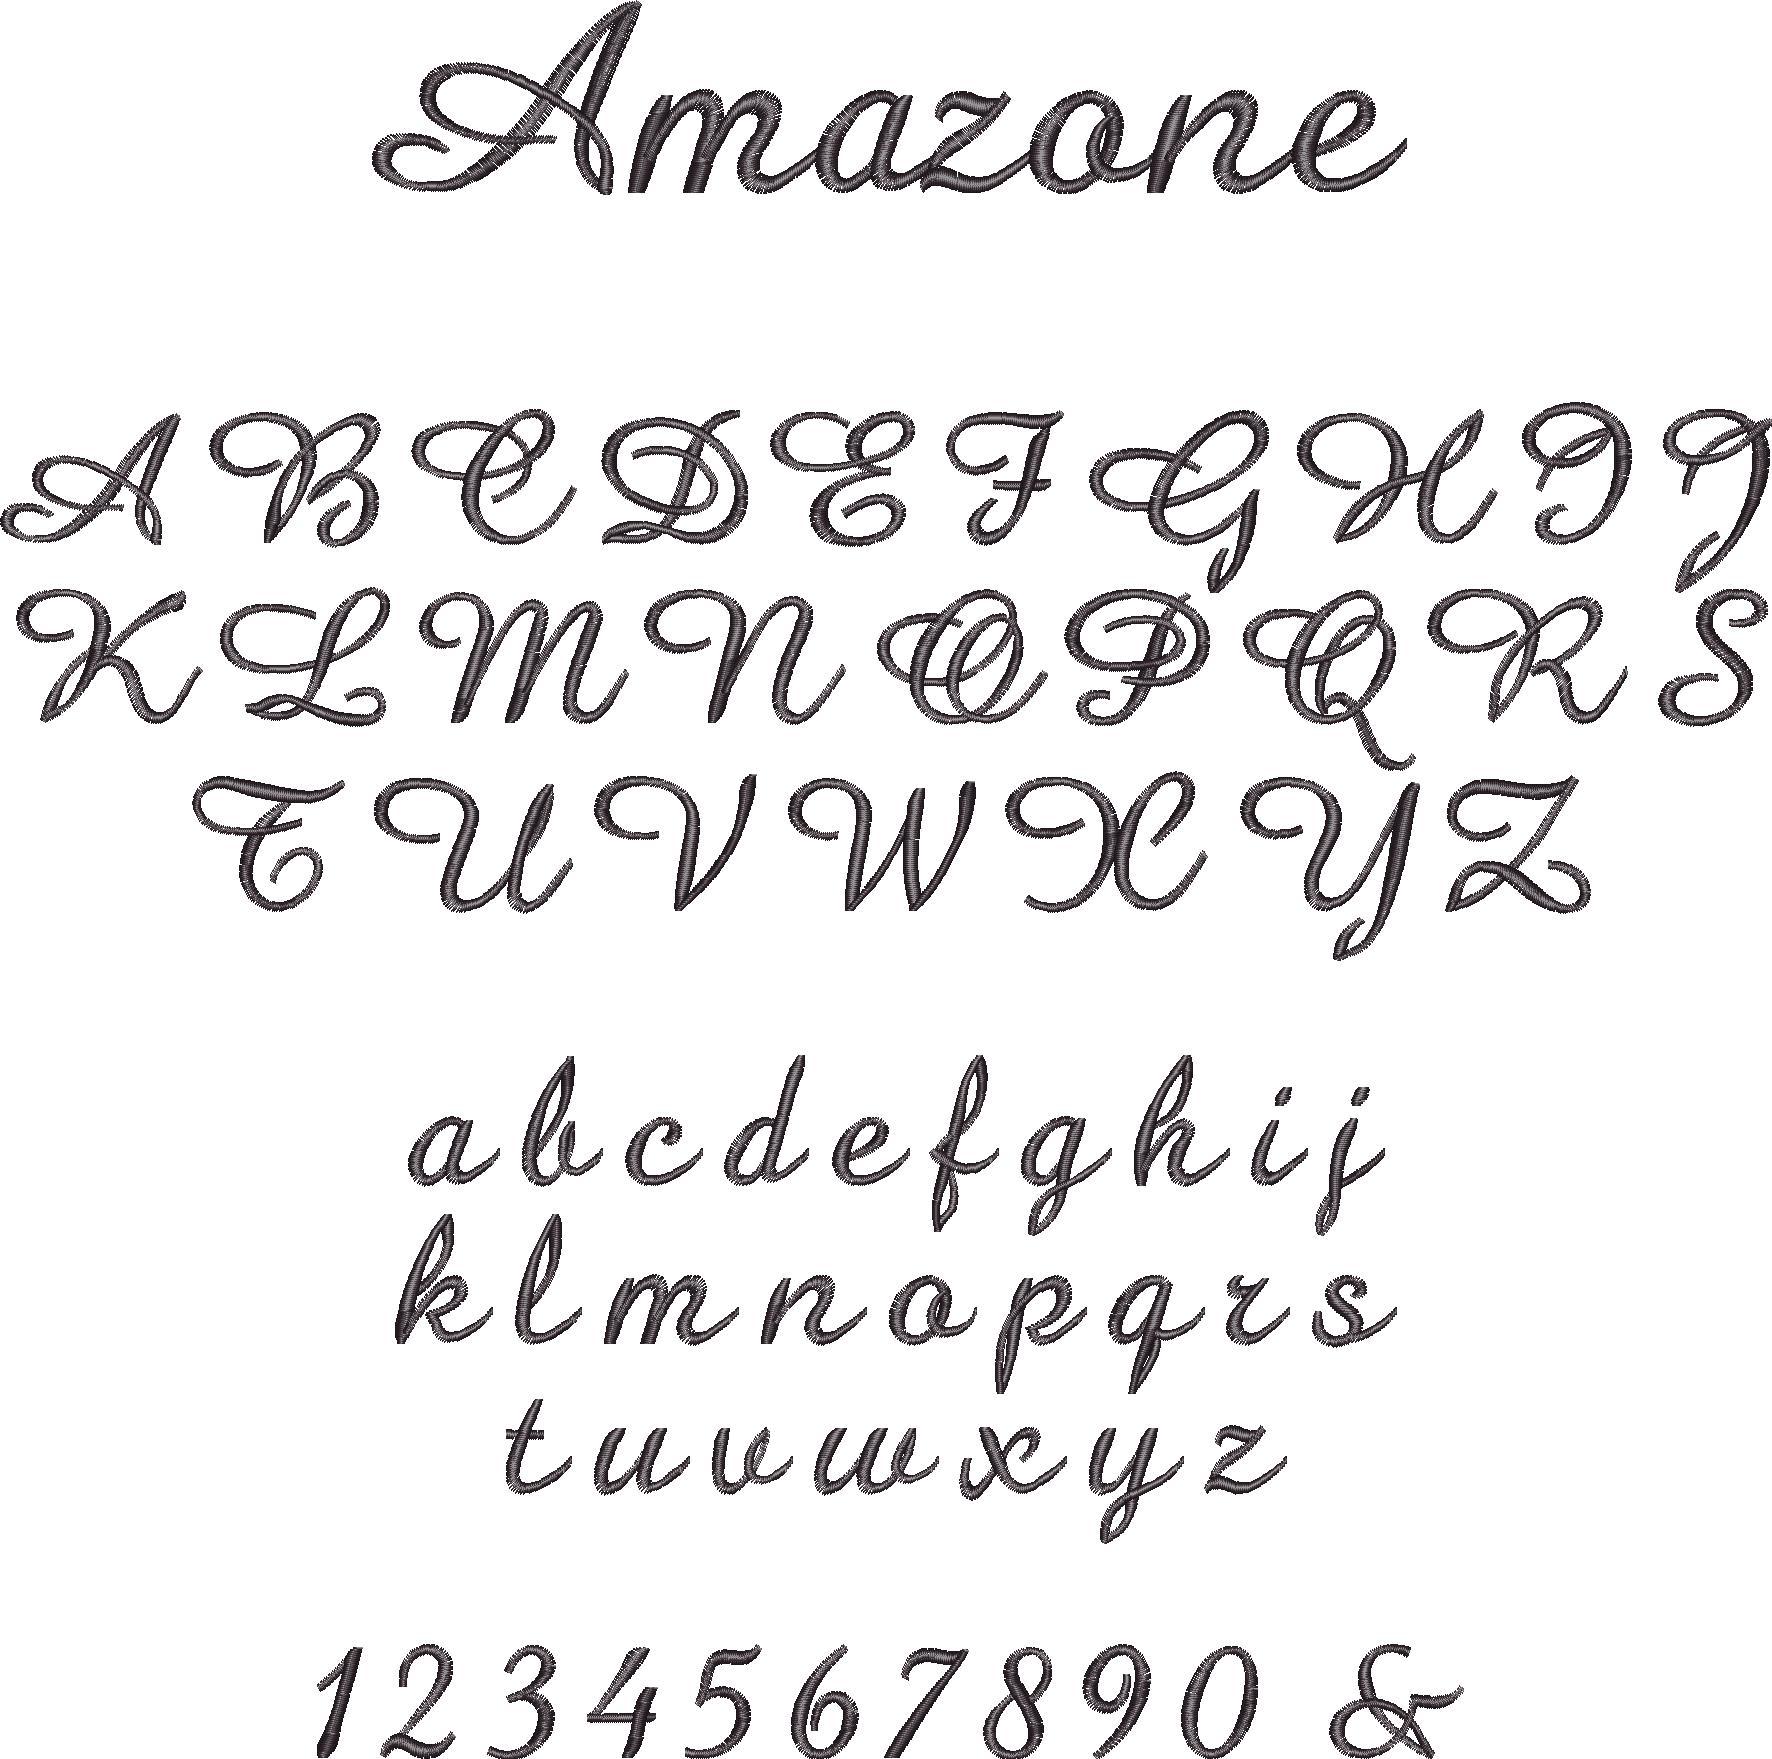 10 Script Font Styles Images Cursive Tattoo Fonts Generator Cursive Tattoo Fonts Script And French Style Script Font Newdesignfile Com